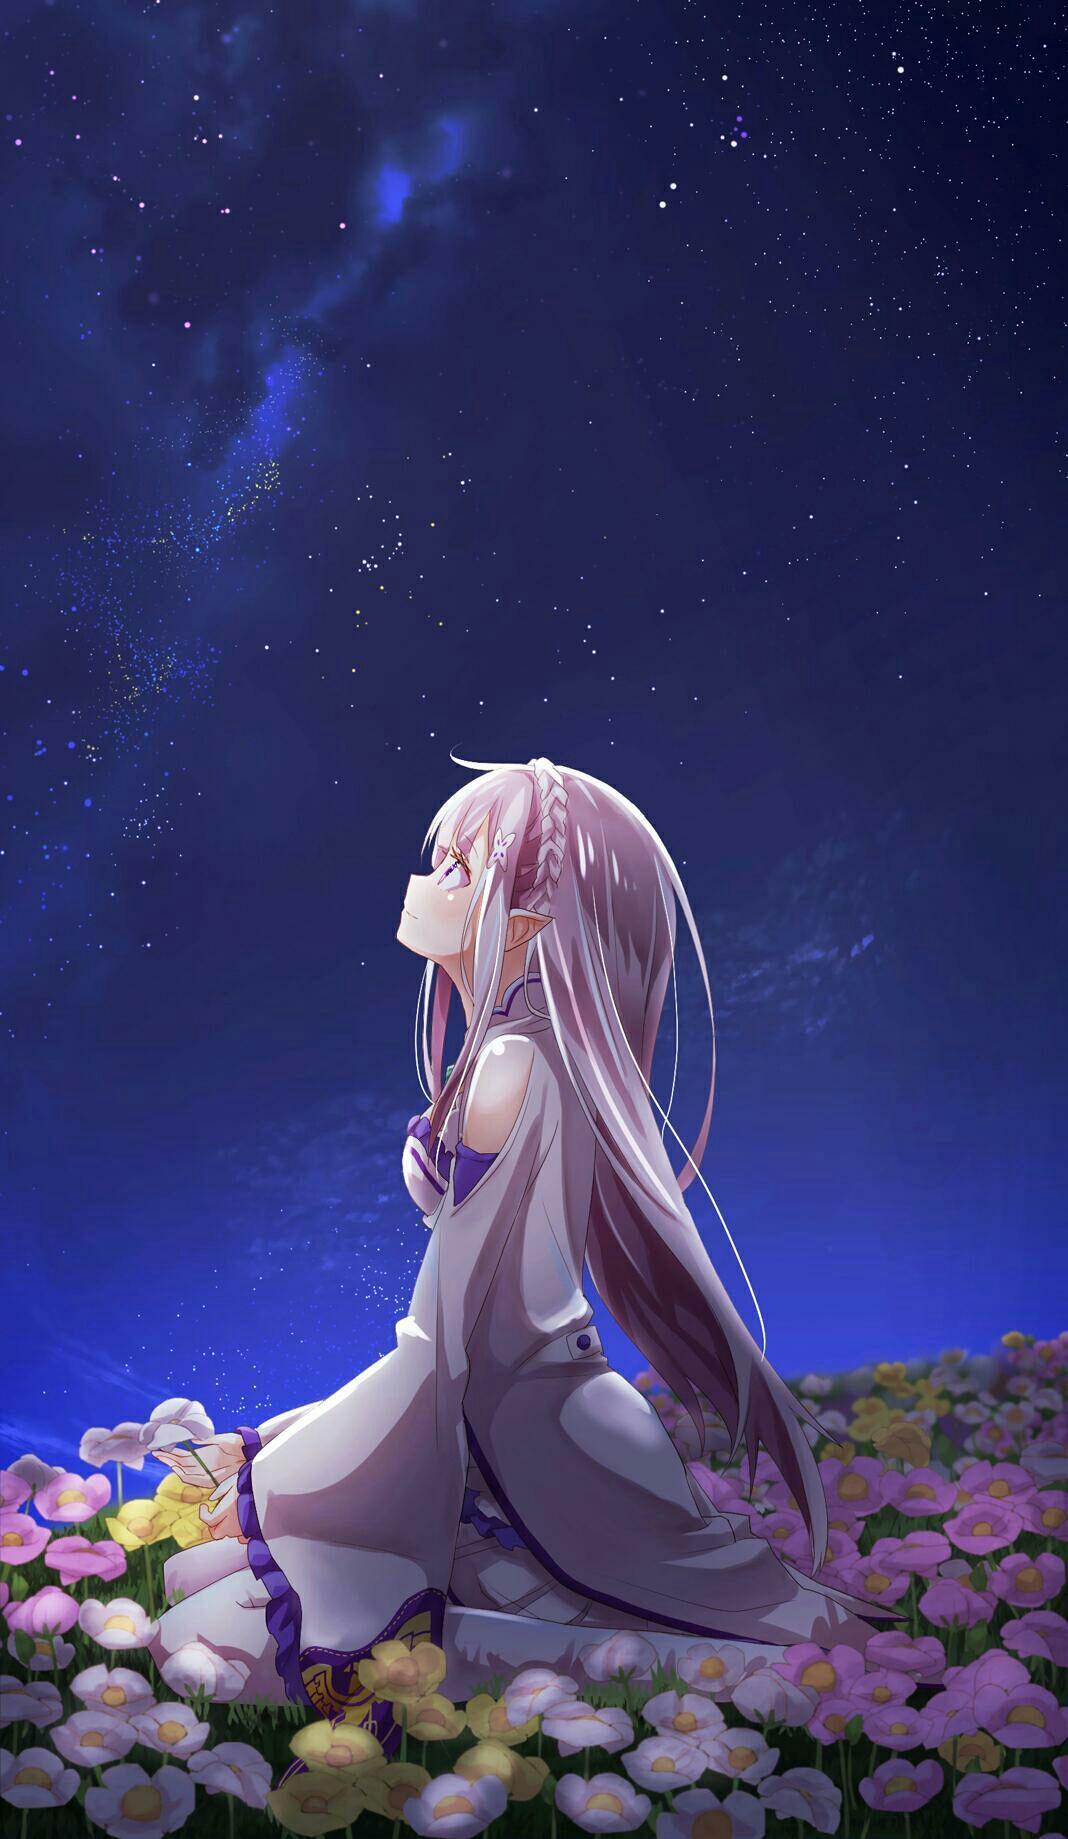 Obrazki Z Anime Anime Background Hd Anime Wallpapers Anime Scenery